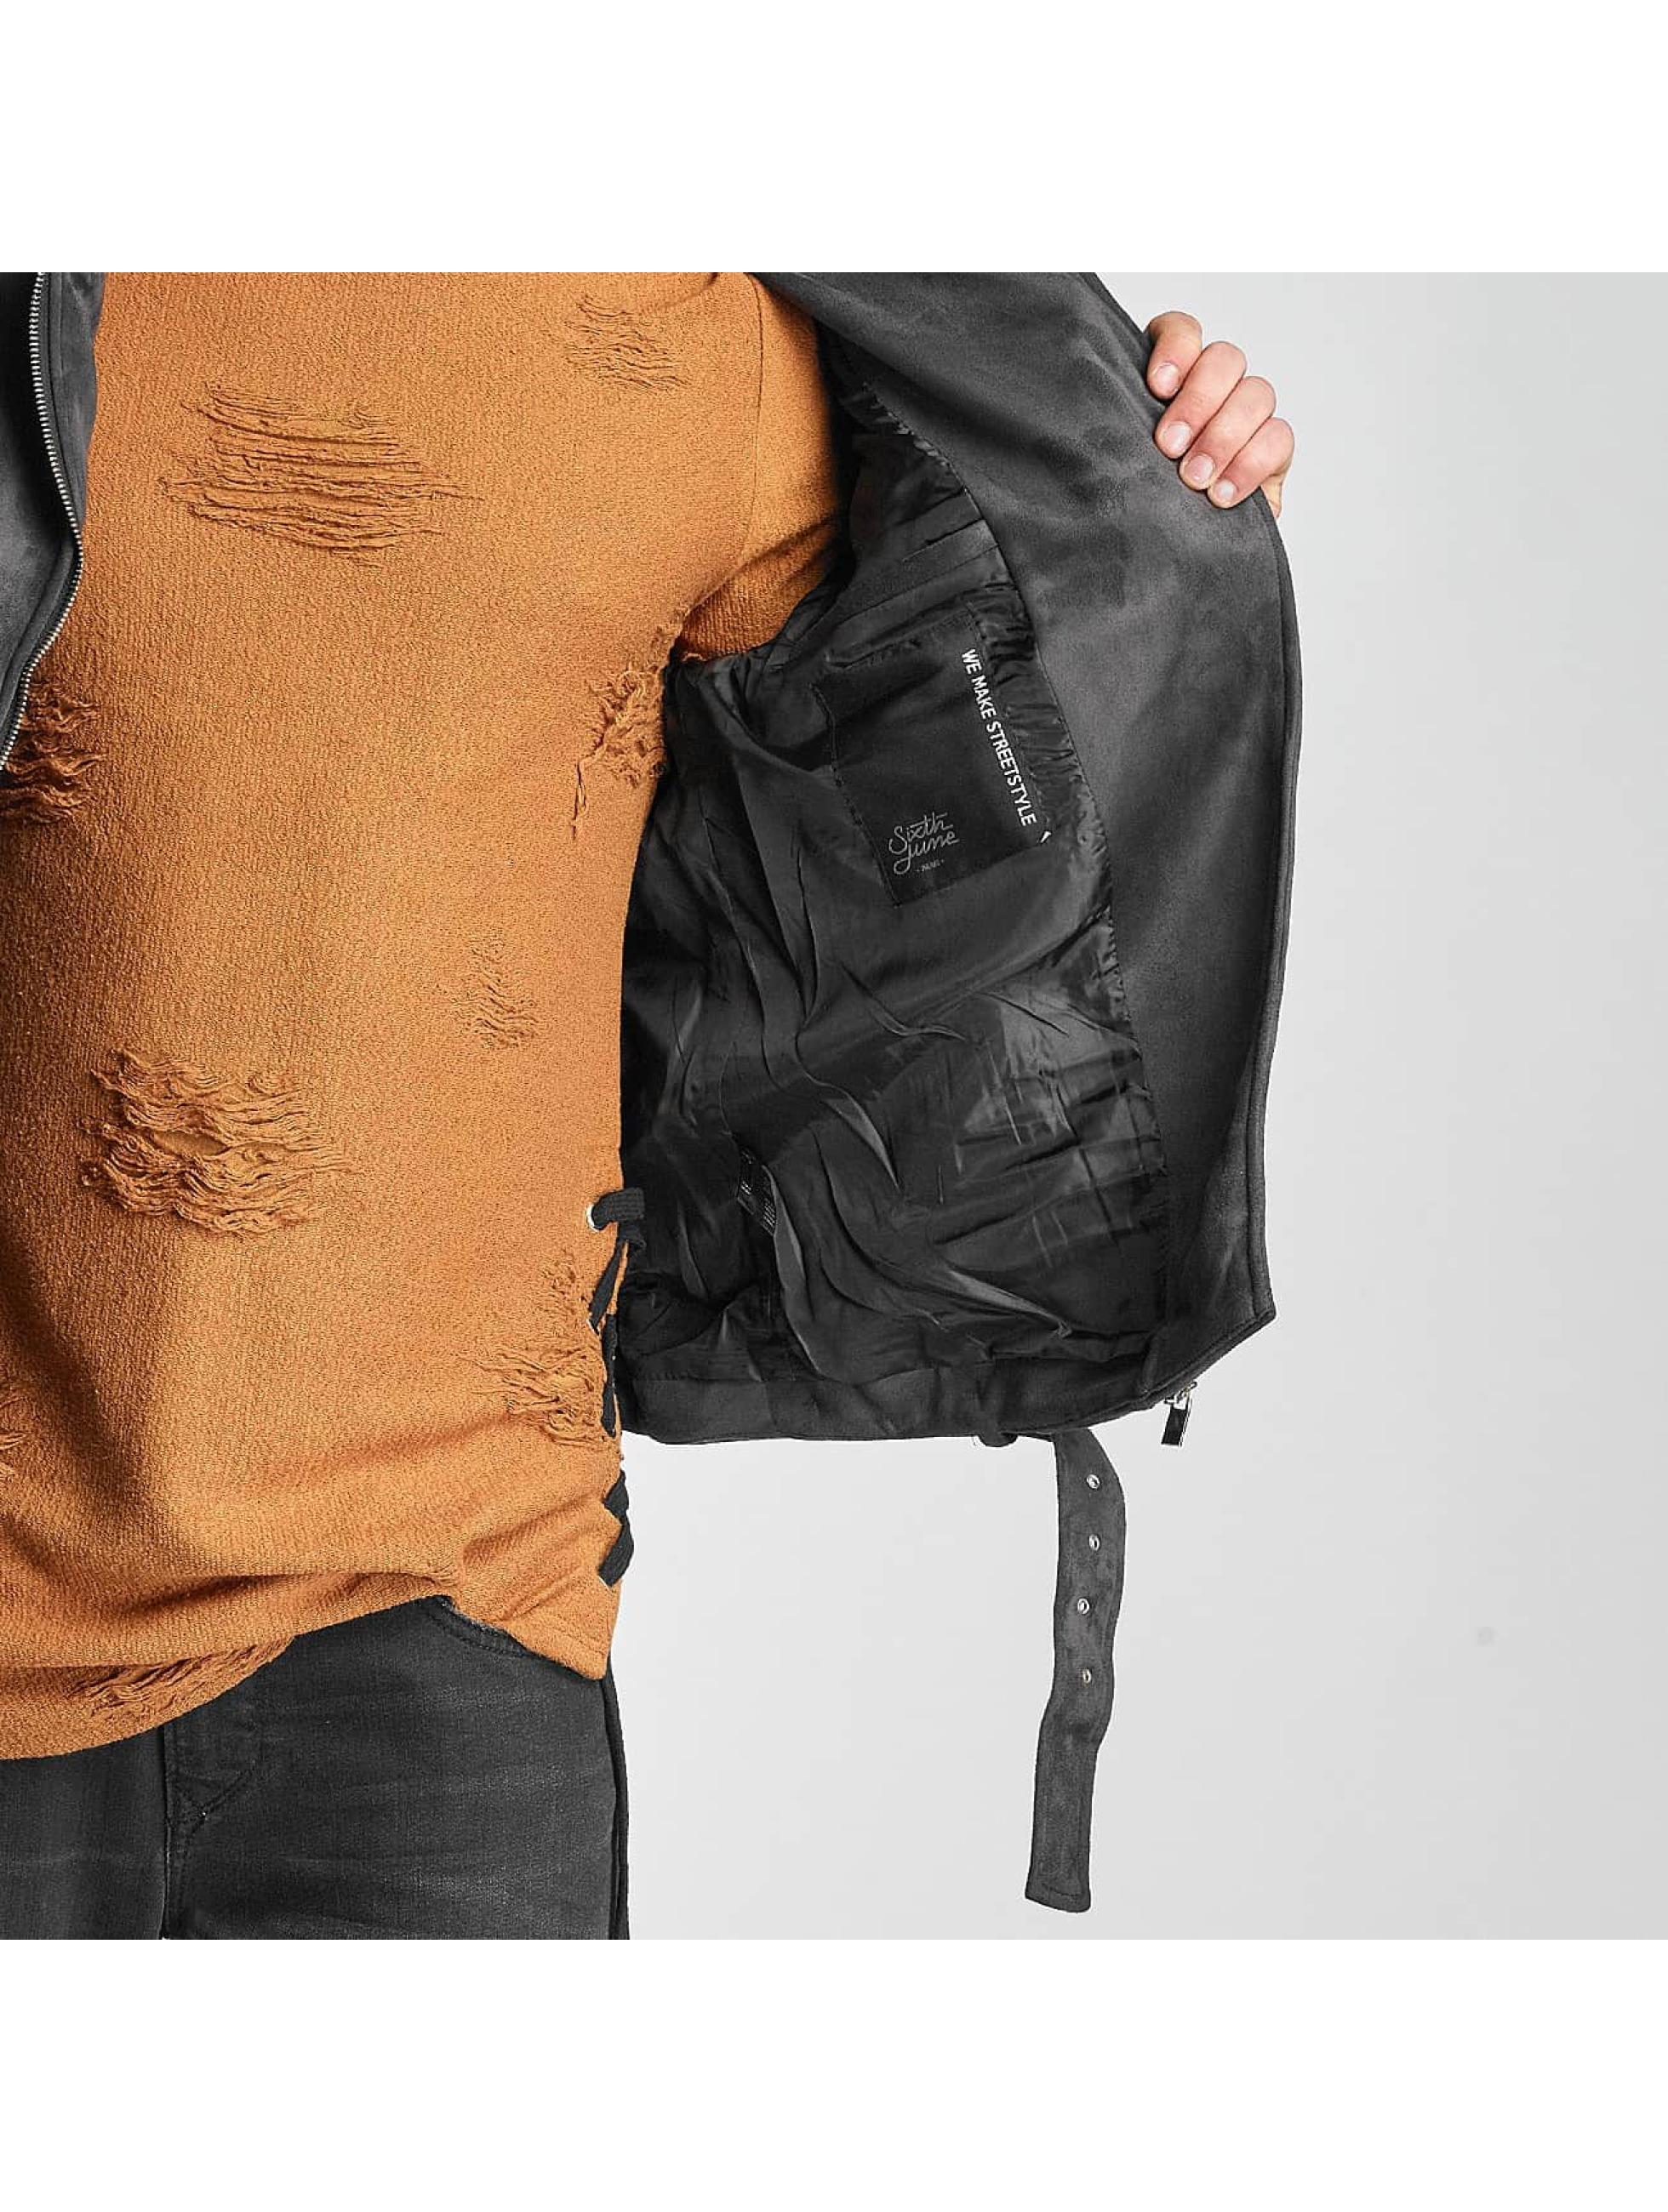 Sixth June Leather Jacket Perfecto grey